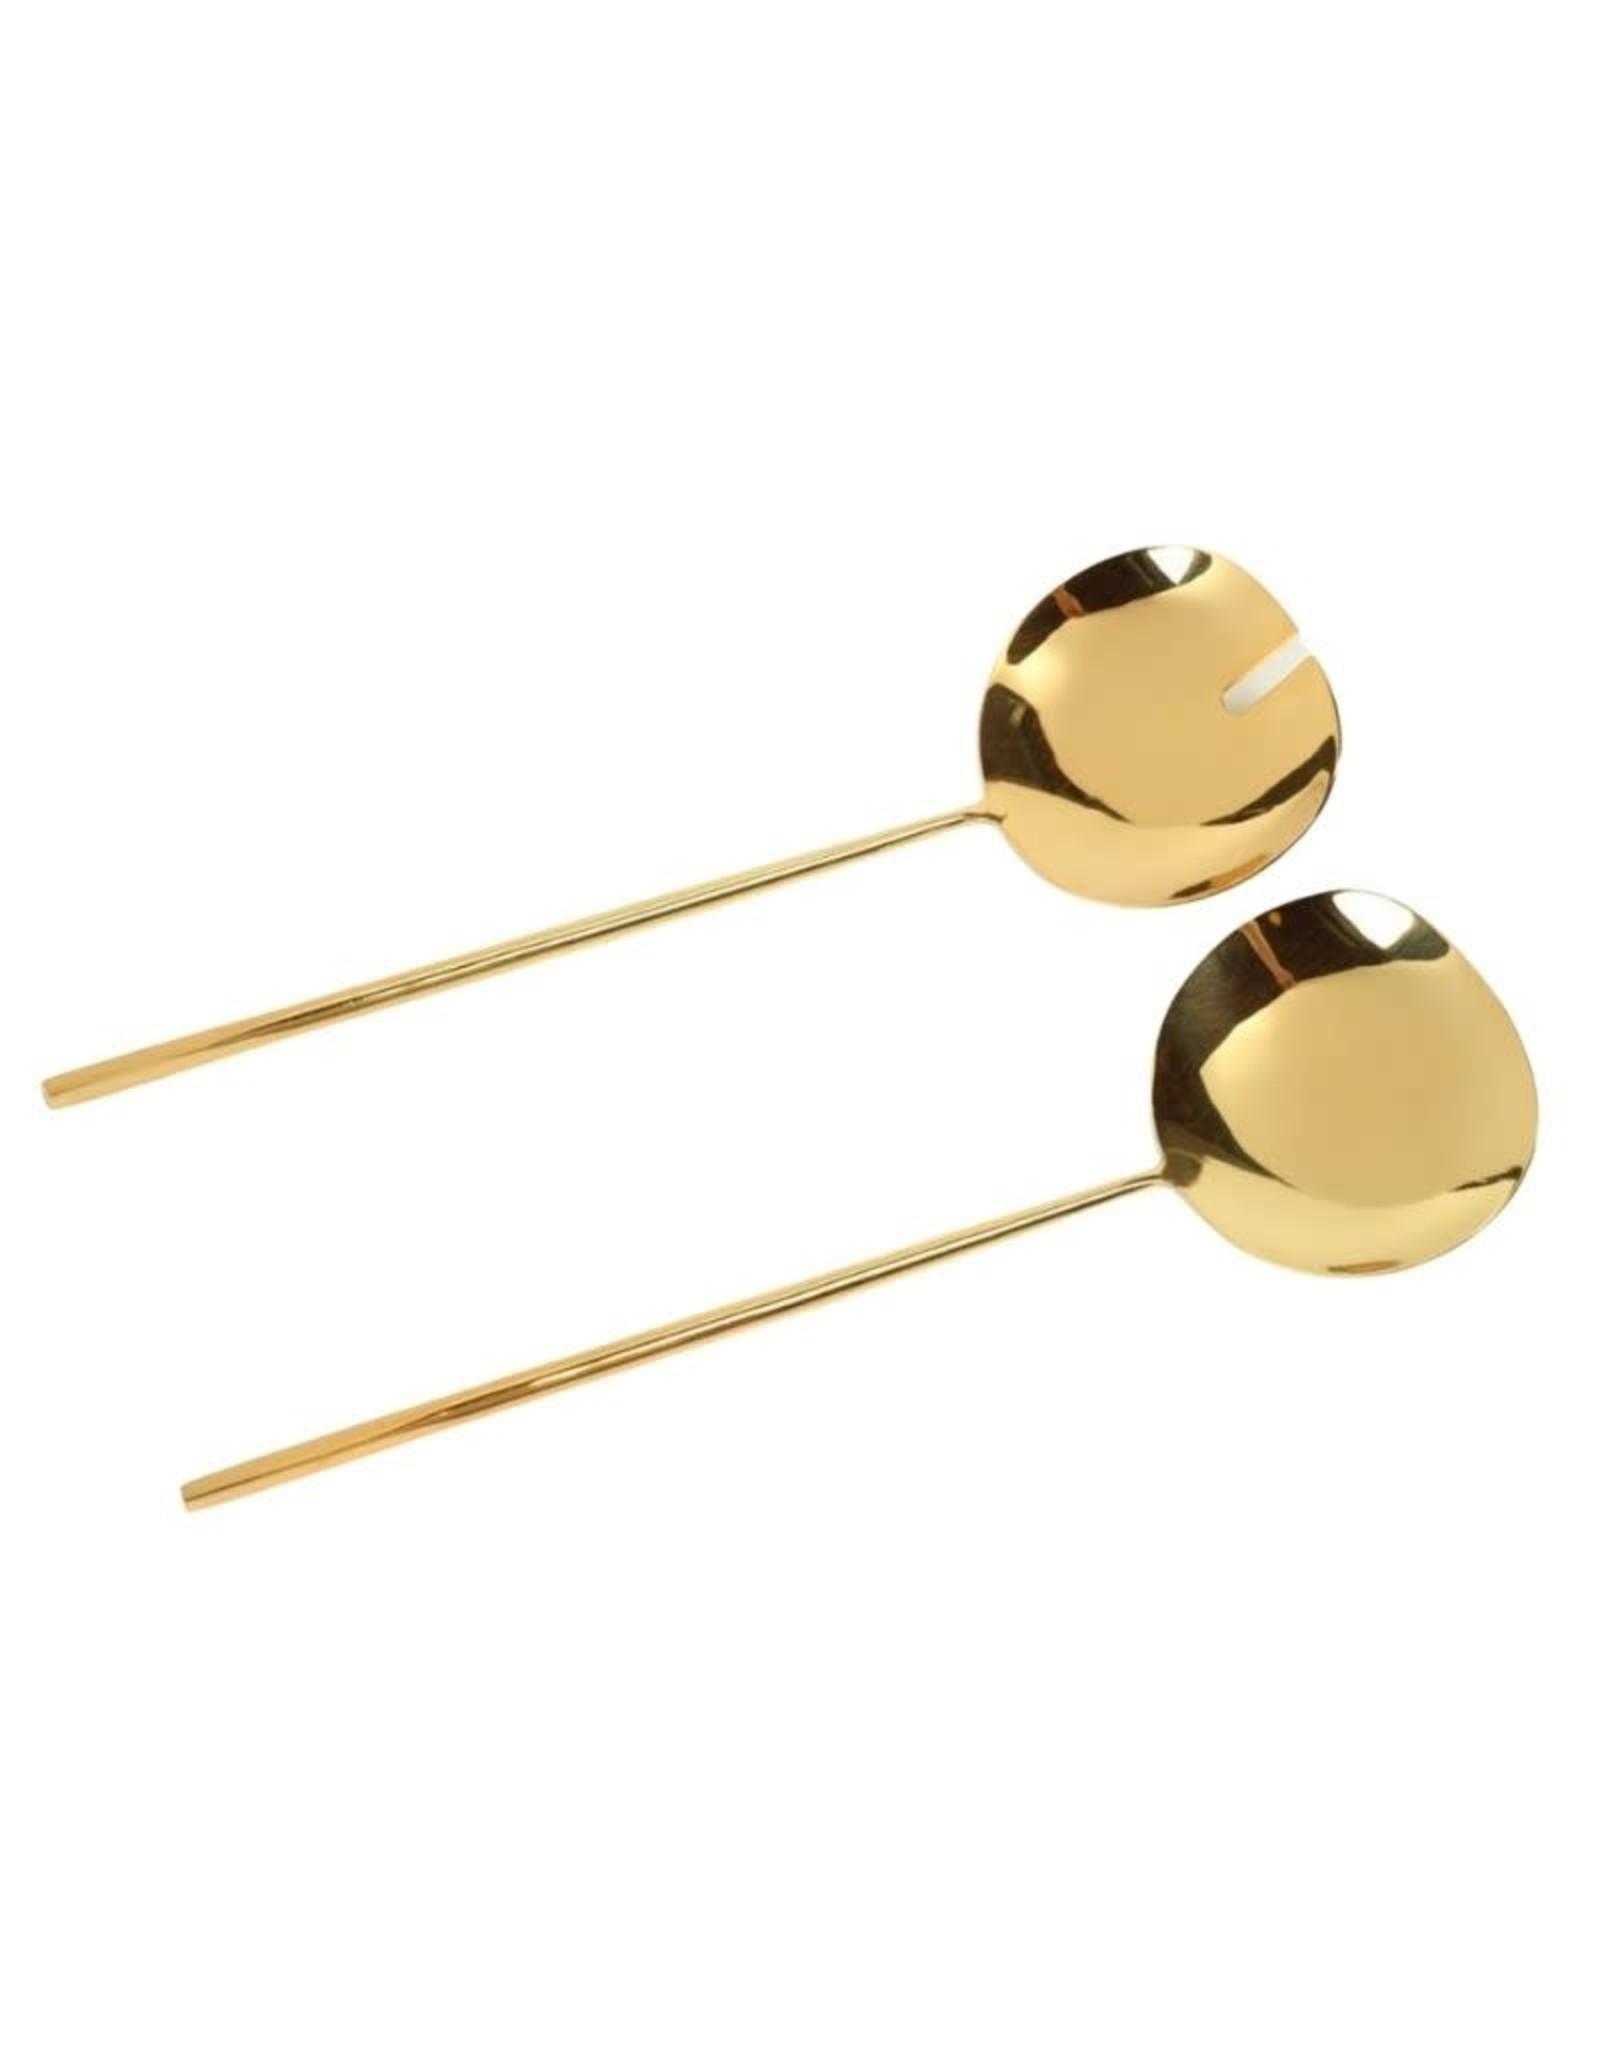 Dainty Polished Gold Server Set